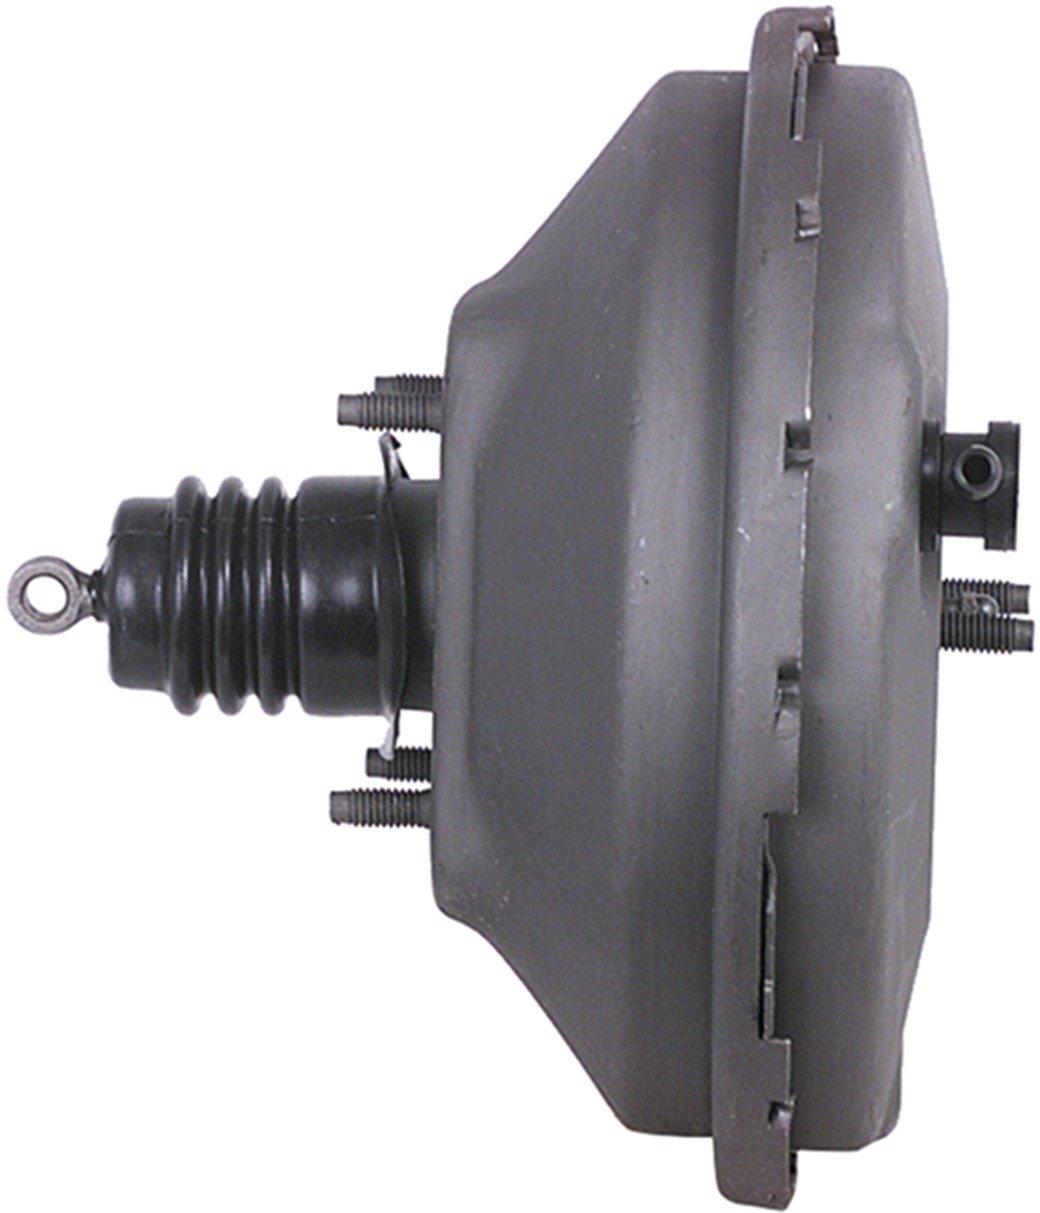 Cardone 54-73703 Remanufactured Power Brake Booster A-1 Cardone